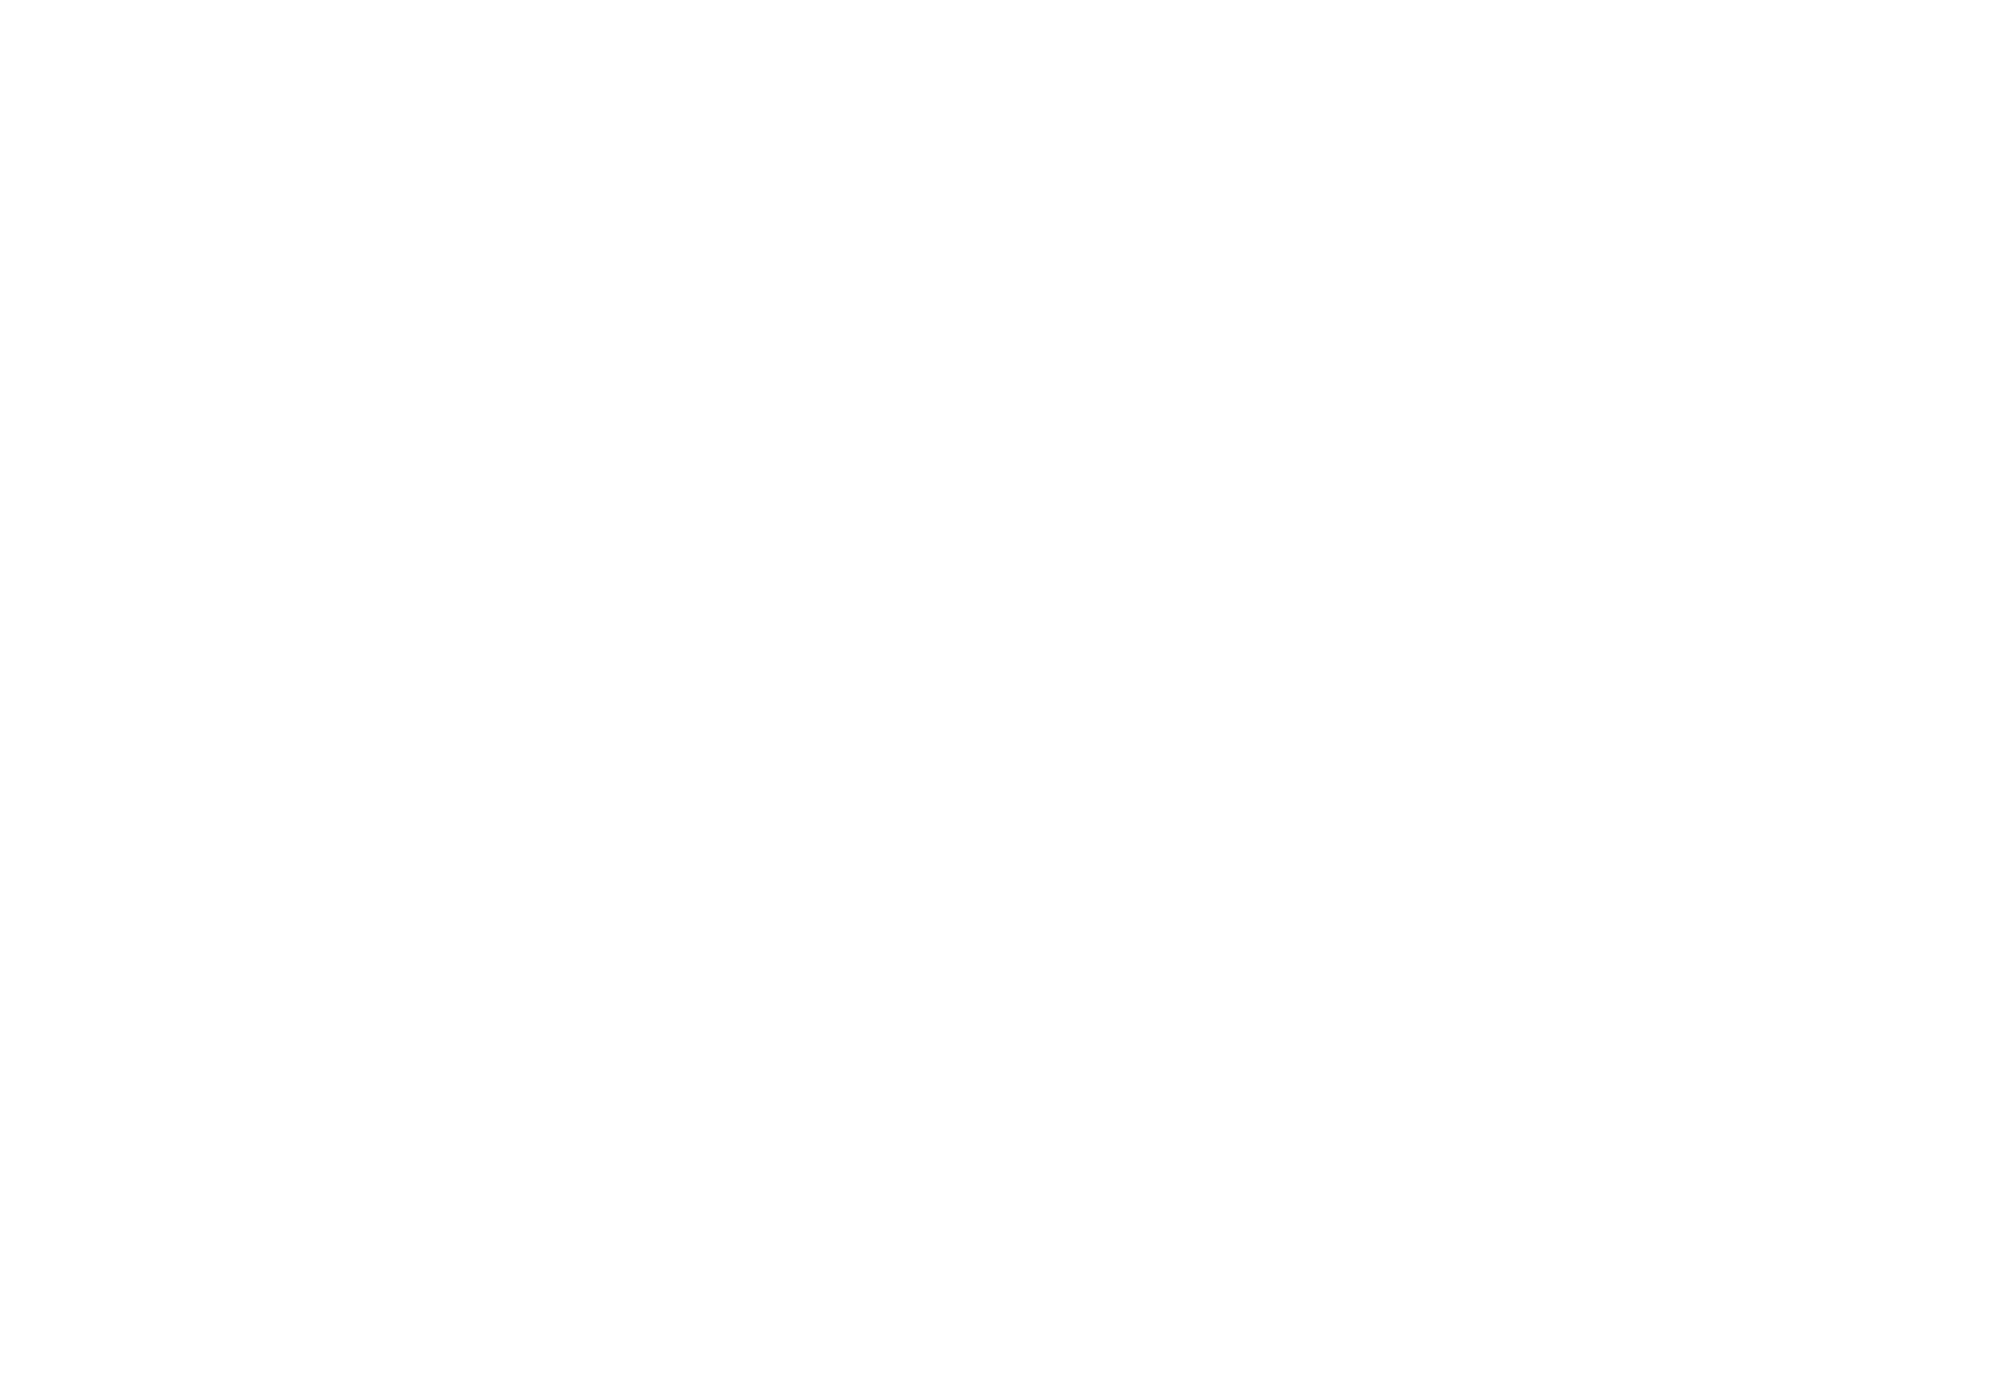 src/assets/stars.png